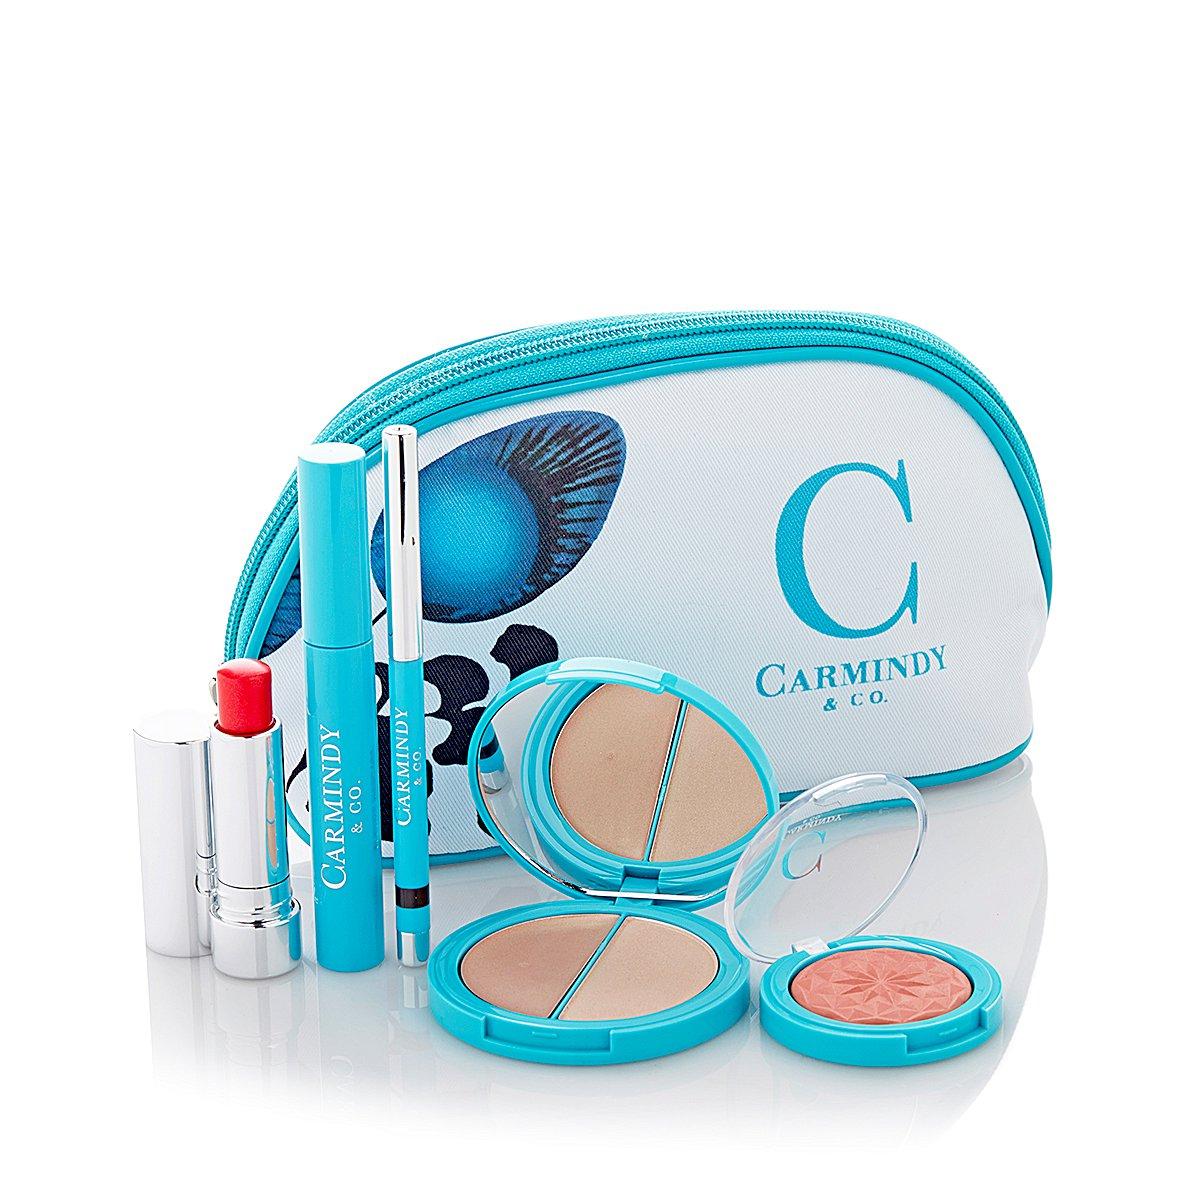 Carmindy & Co. Makeup Line For HSN